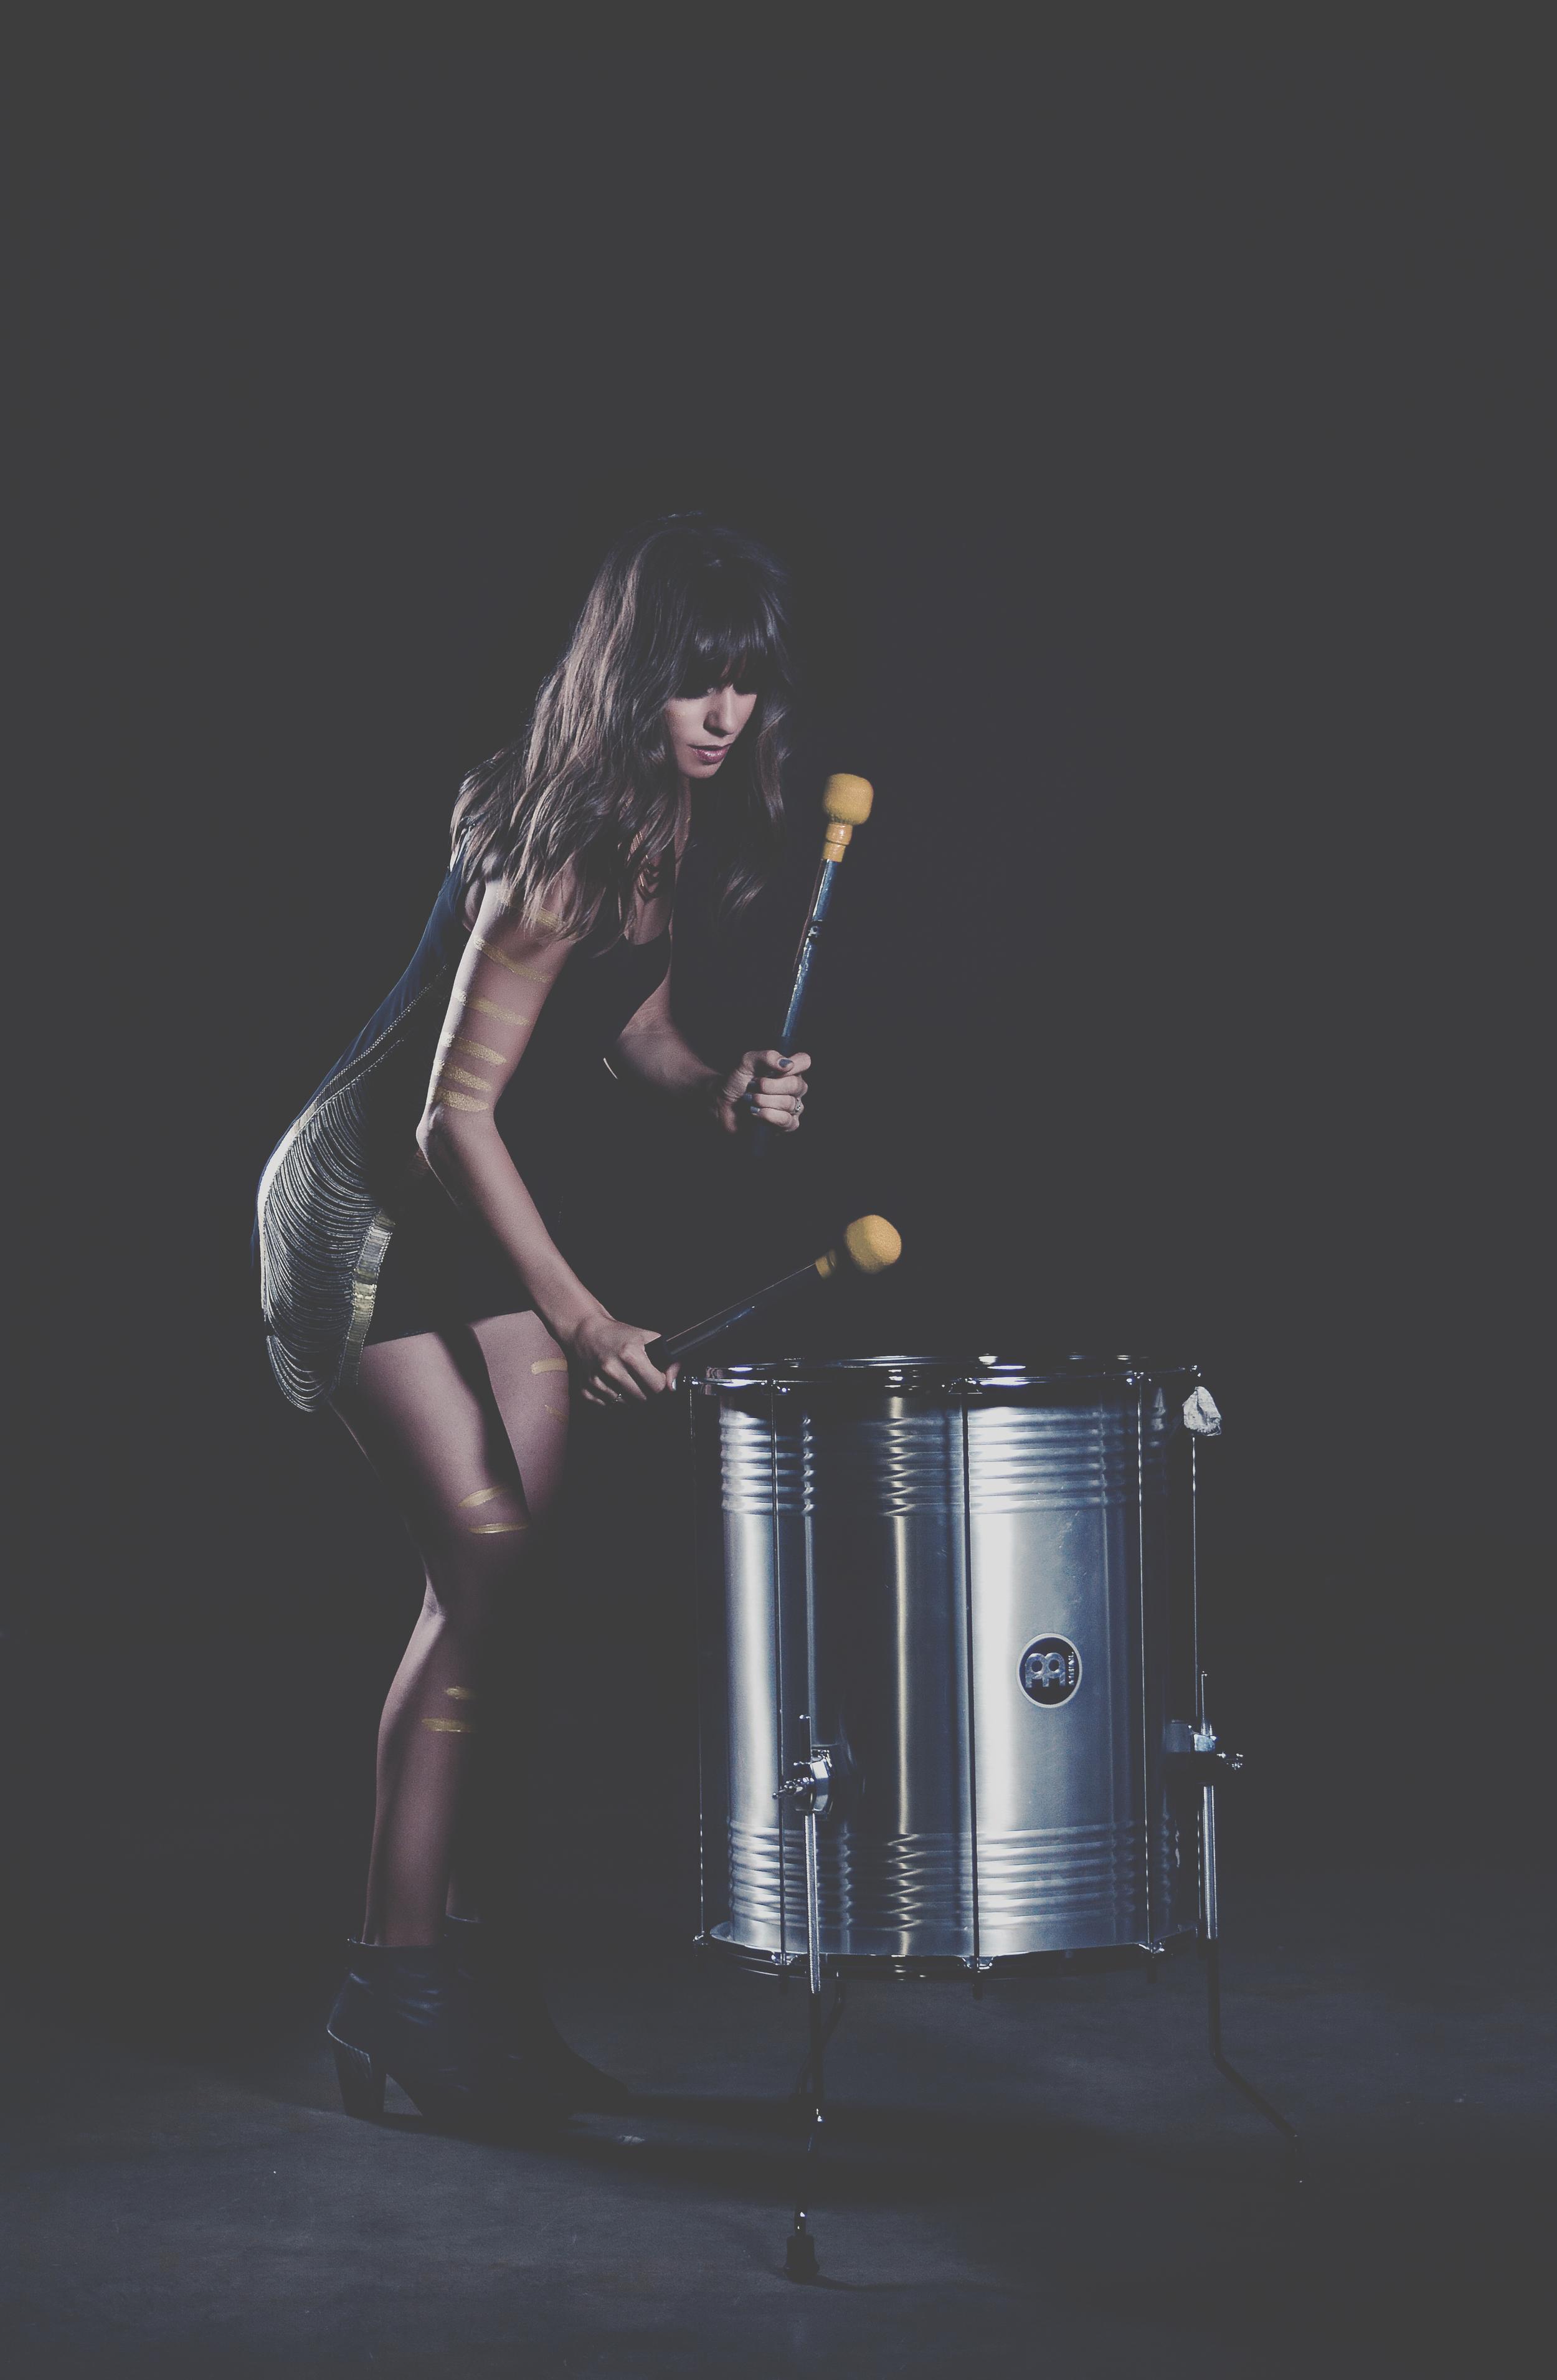 Korbee - Show Me The Way Acoustic - Jenn Korbee 2 - Drum (1).jpg